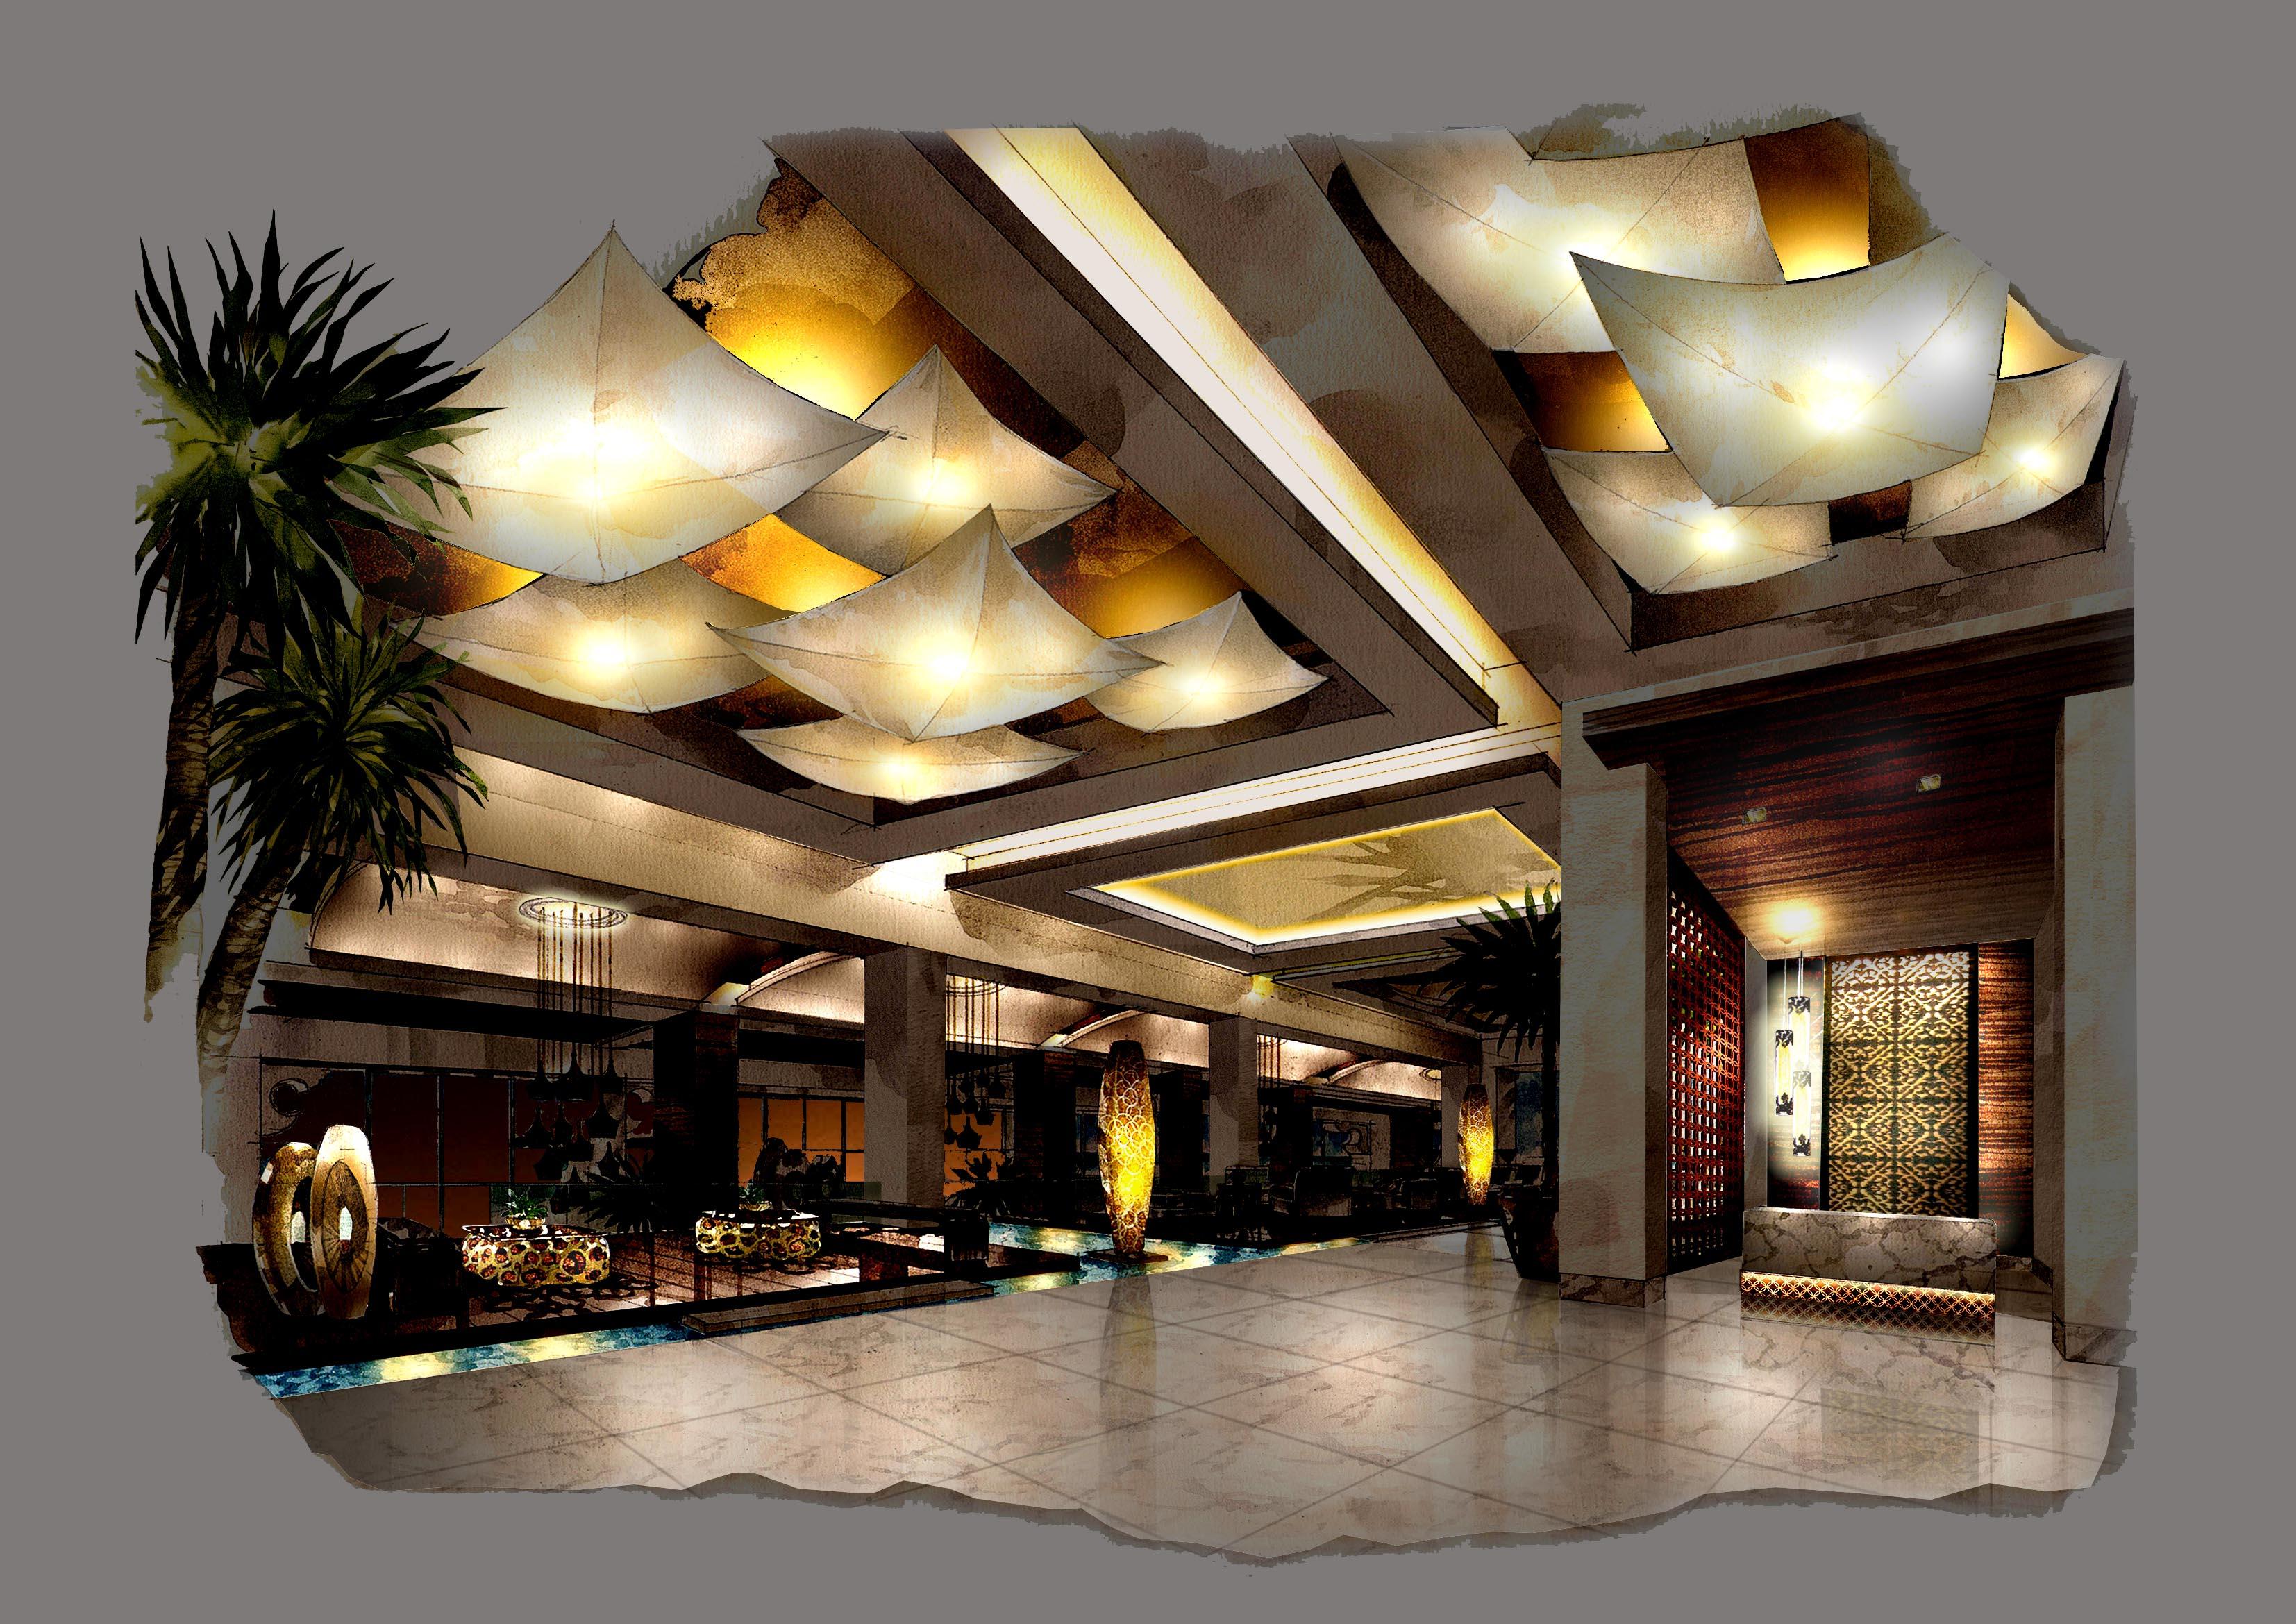 Hospitality Interior Lighting By Siddharth Mathur At